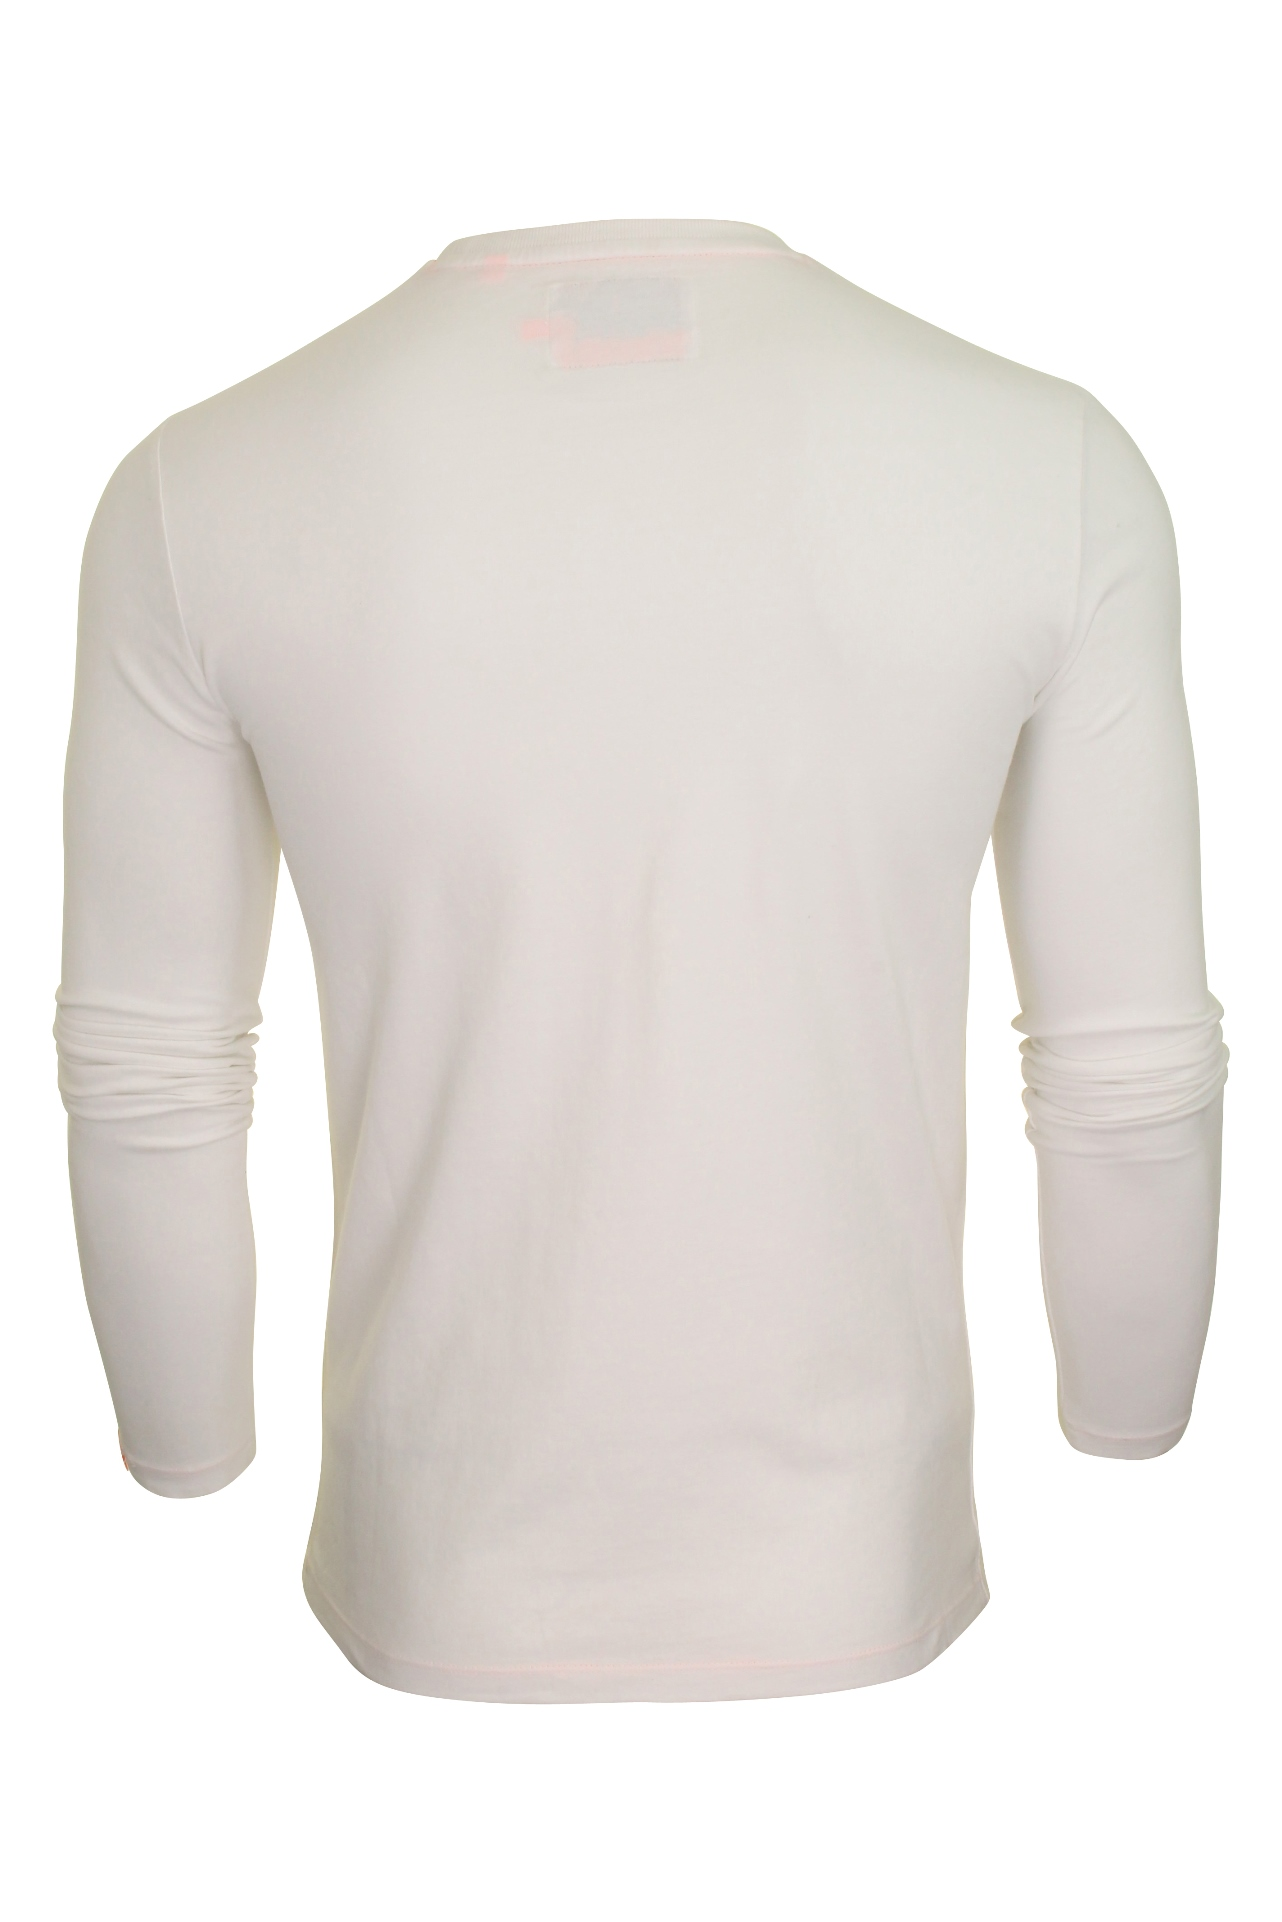 Superdry-Mens-039-Orange-Label-Vintage-039-T-Shirt-Long-Sleeved thumbnail 8